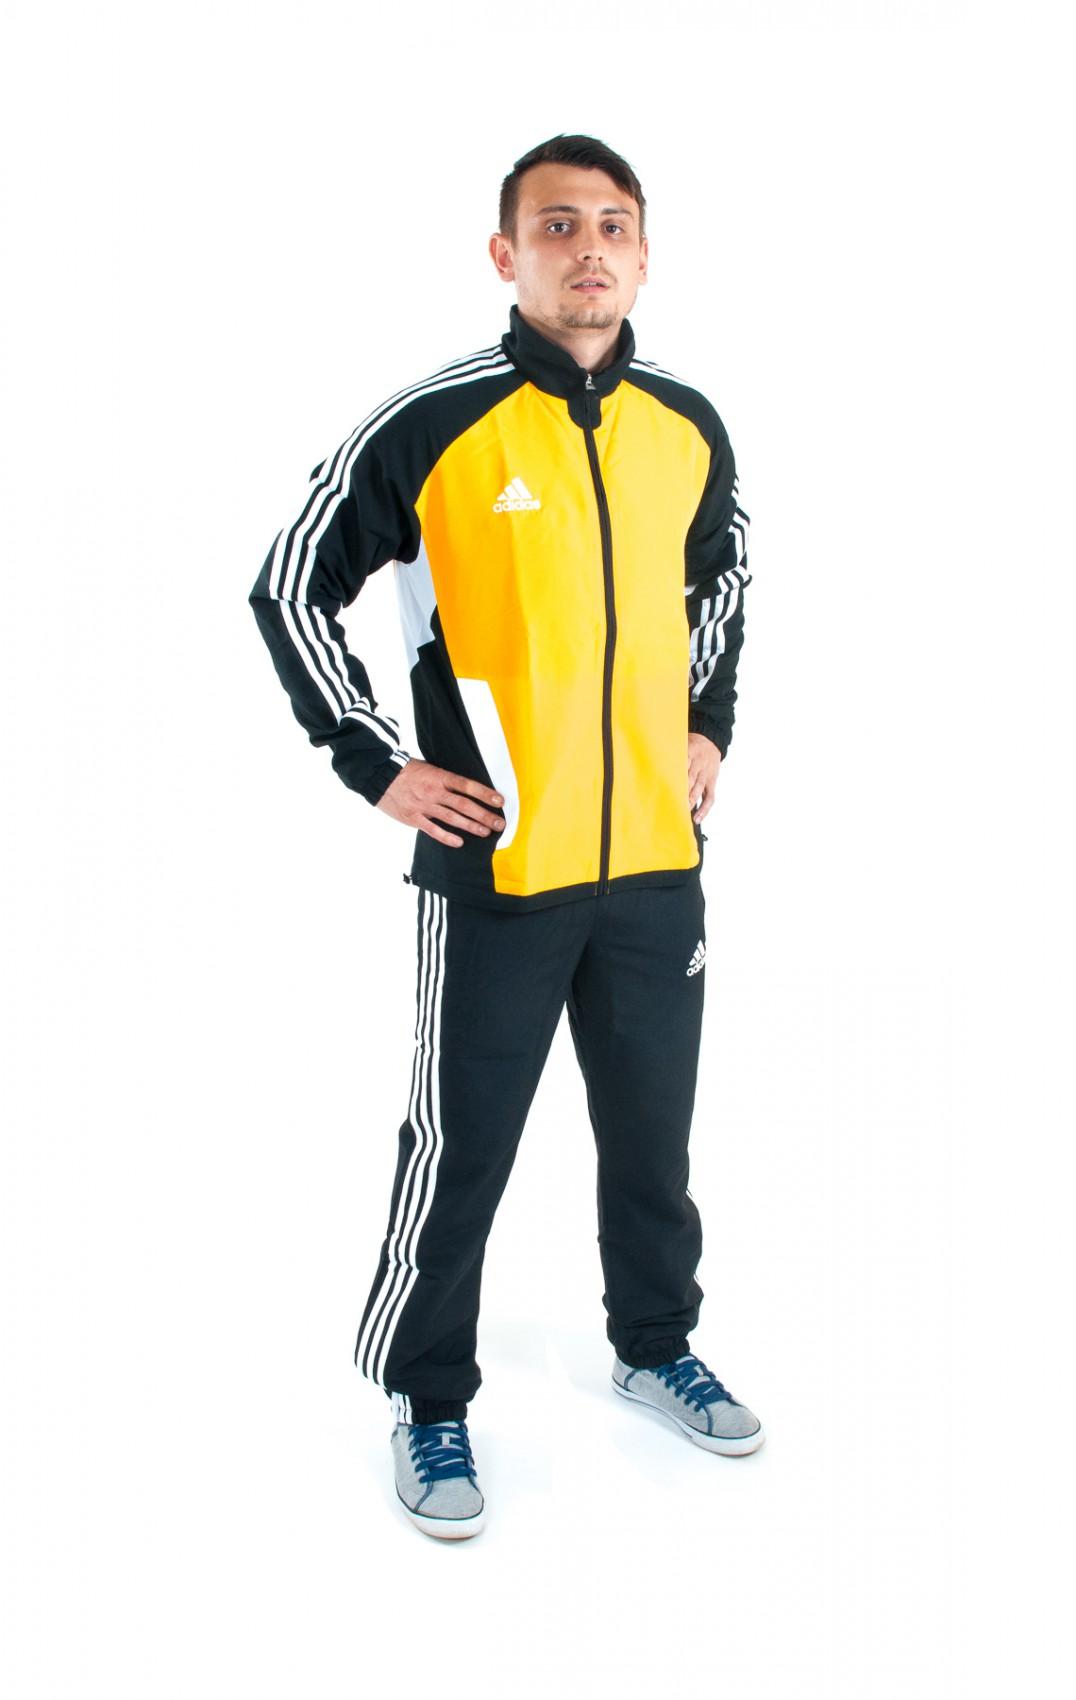 ADIDAS Menu0026#39;s Tiro 11 Presentation Suit Pre Suit Tracksuit Jogging Suit | eBay